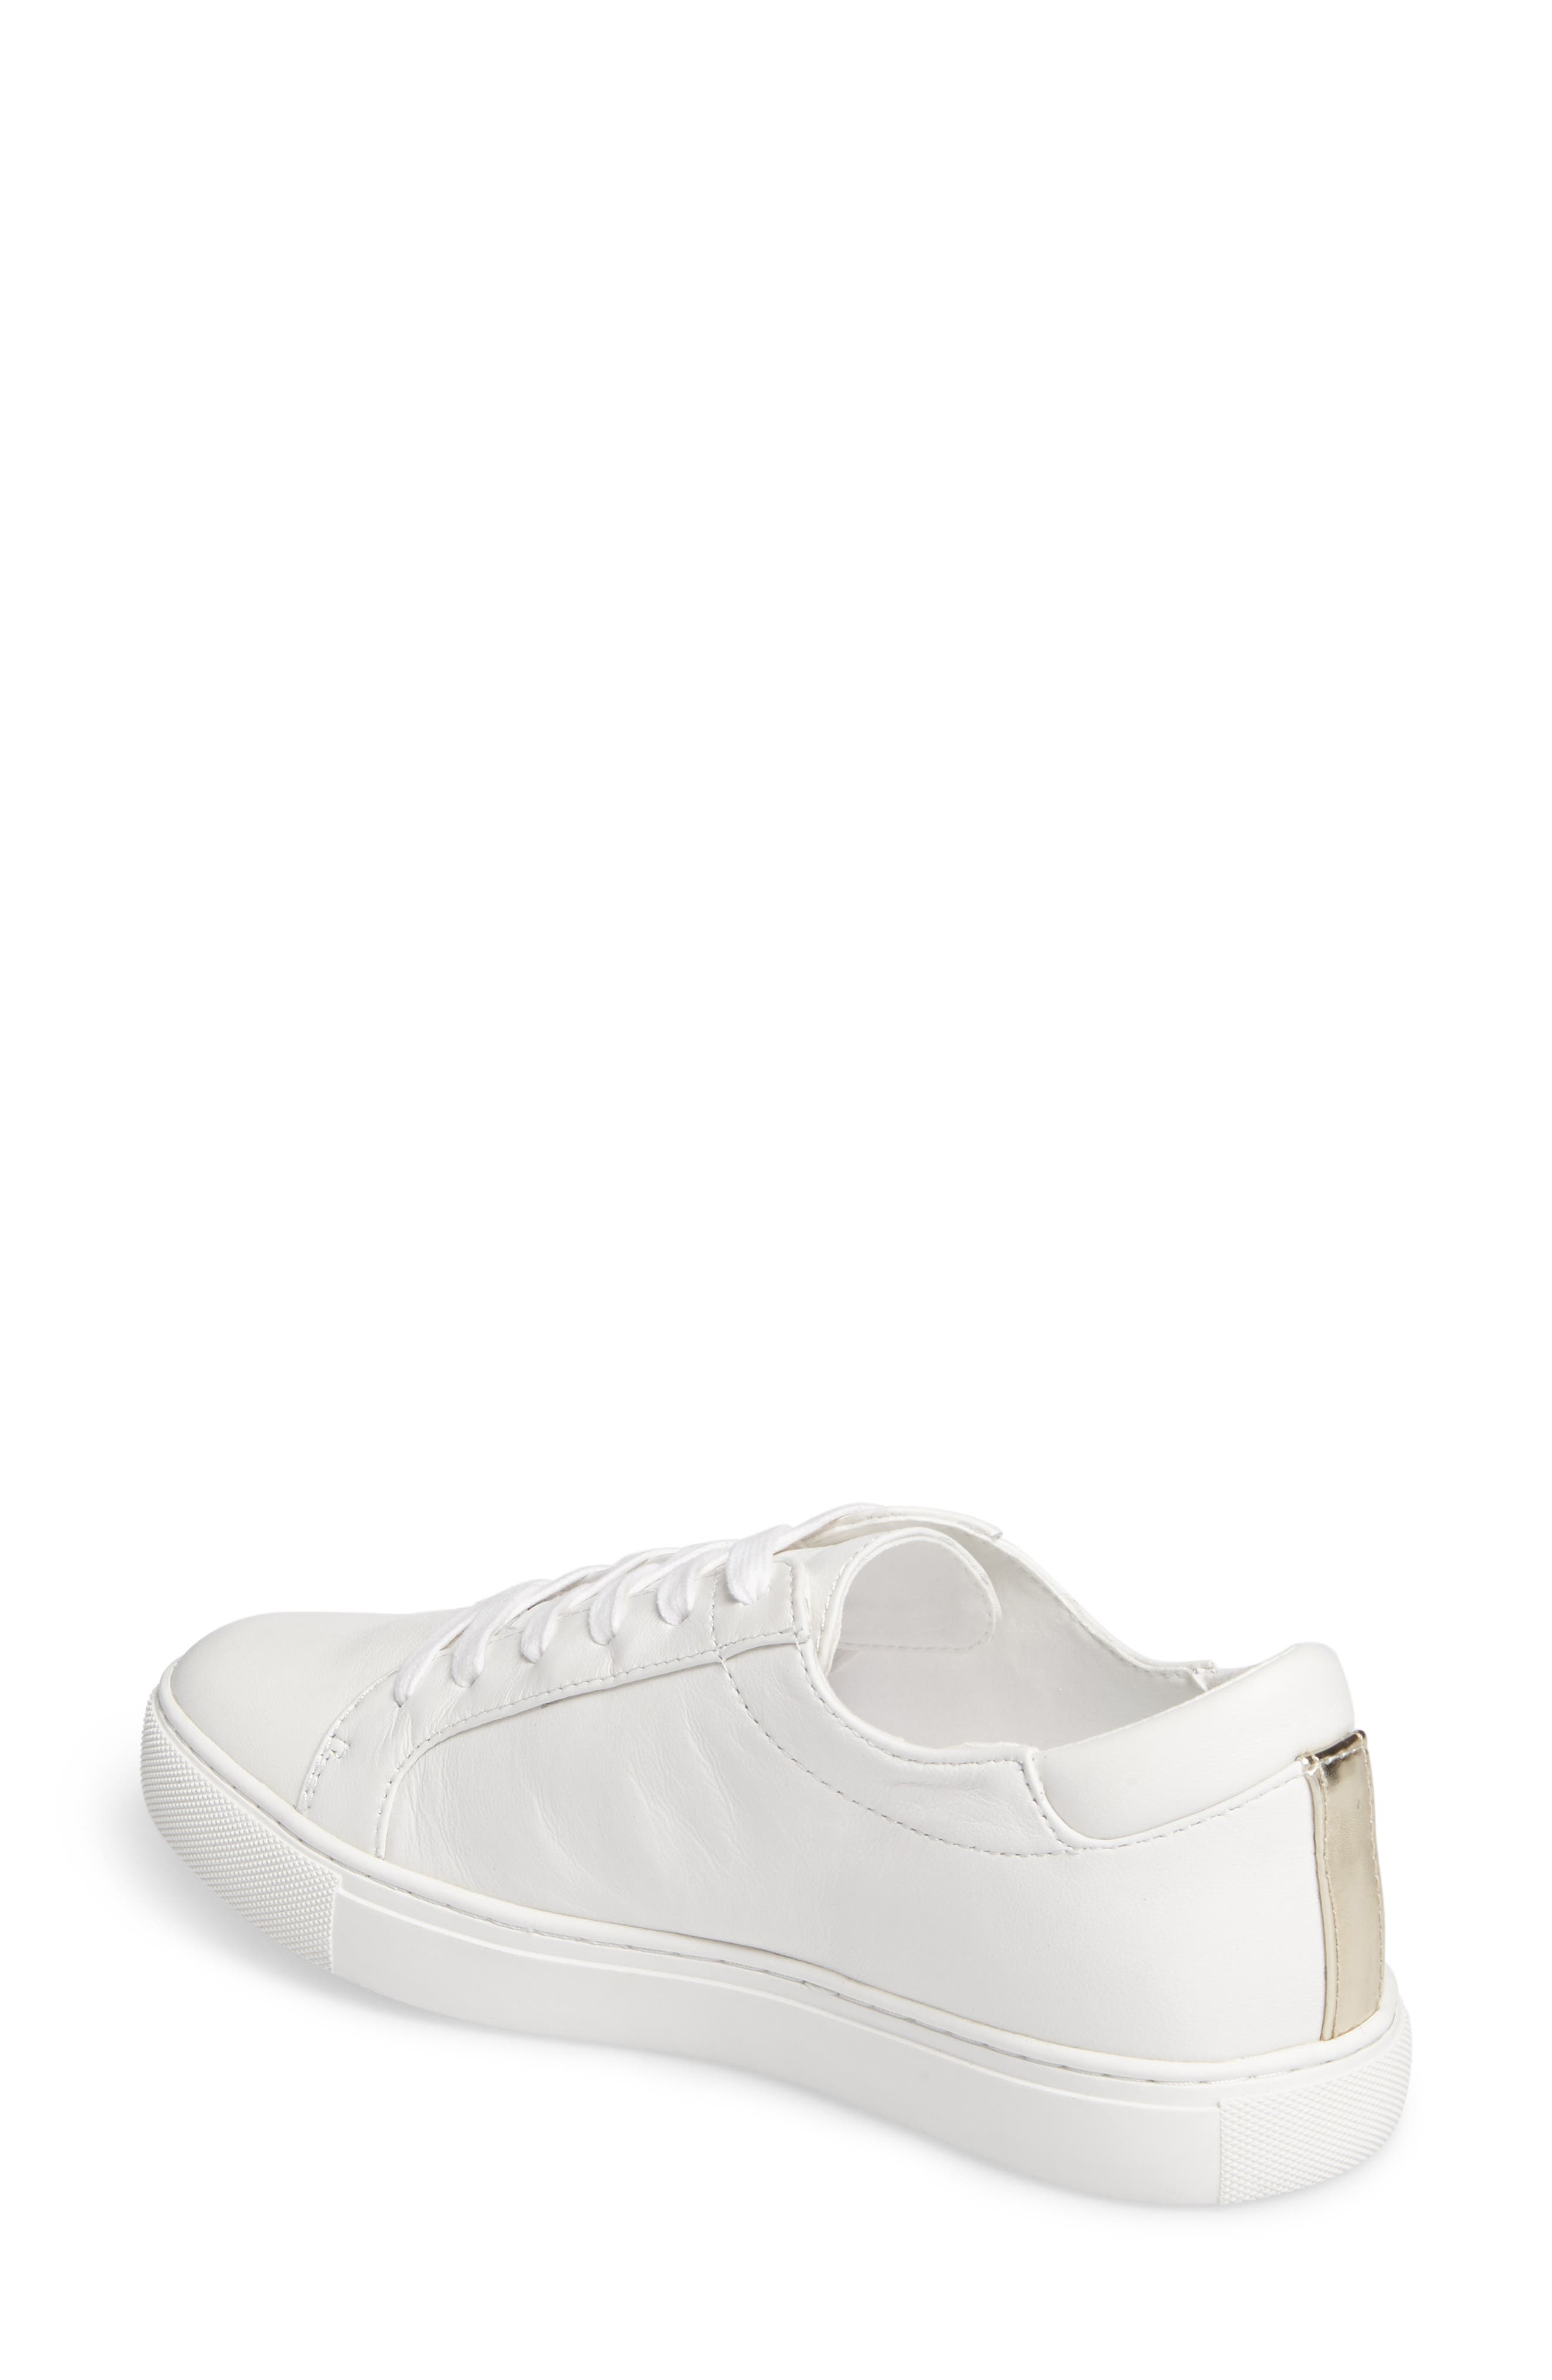 Kam NYC Sneaker,                             Alternate thumbnail 4, color,